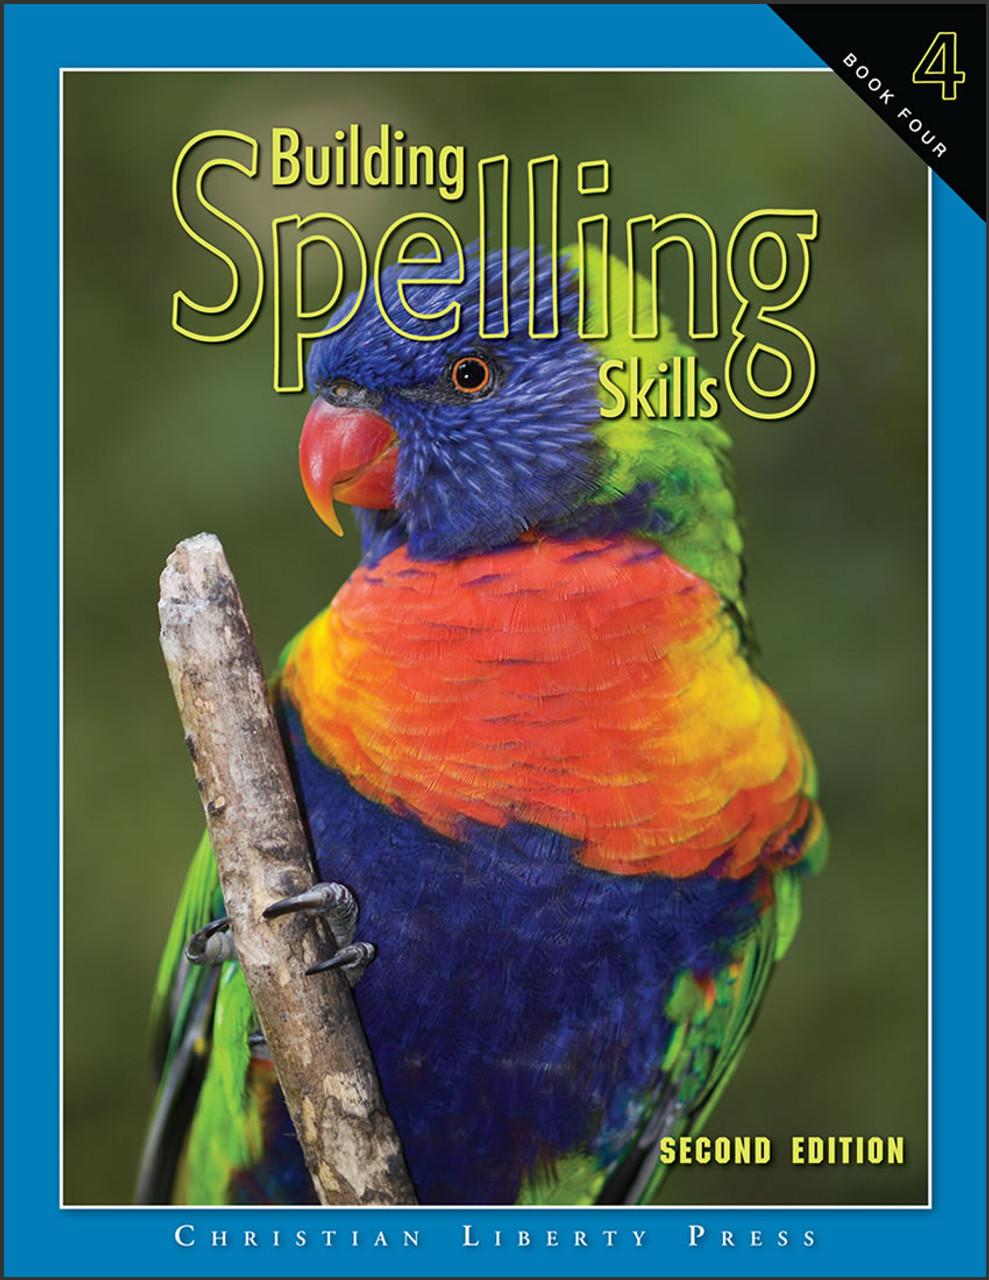 Building Spelling Skills 4, 2nd edition